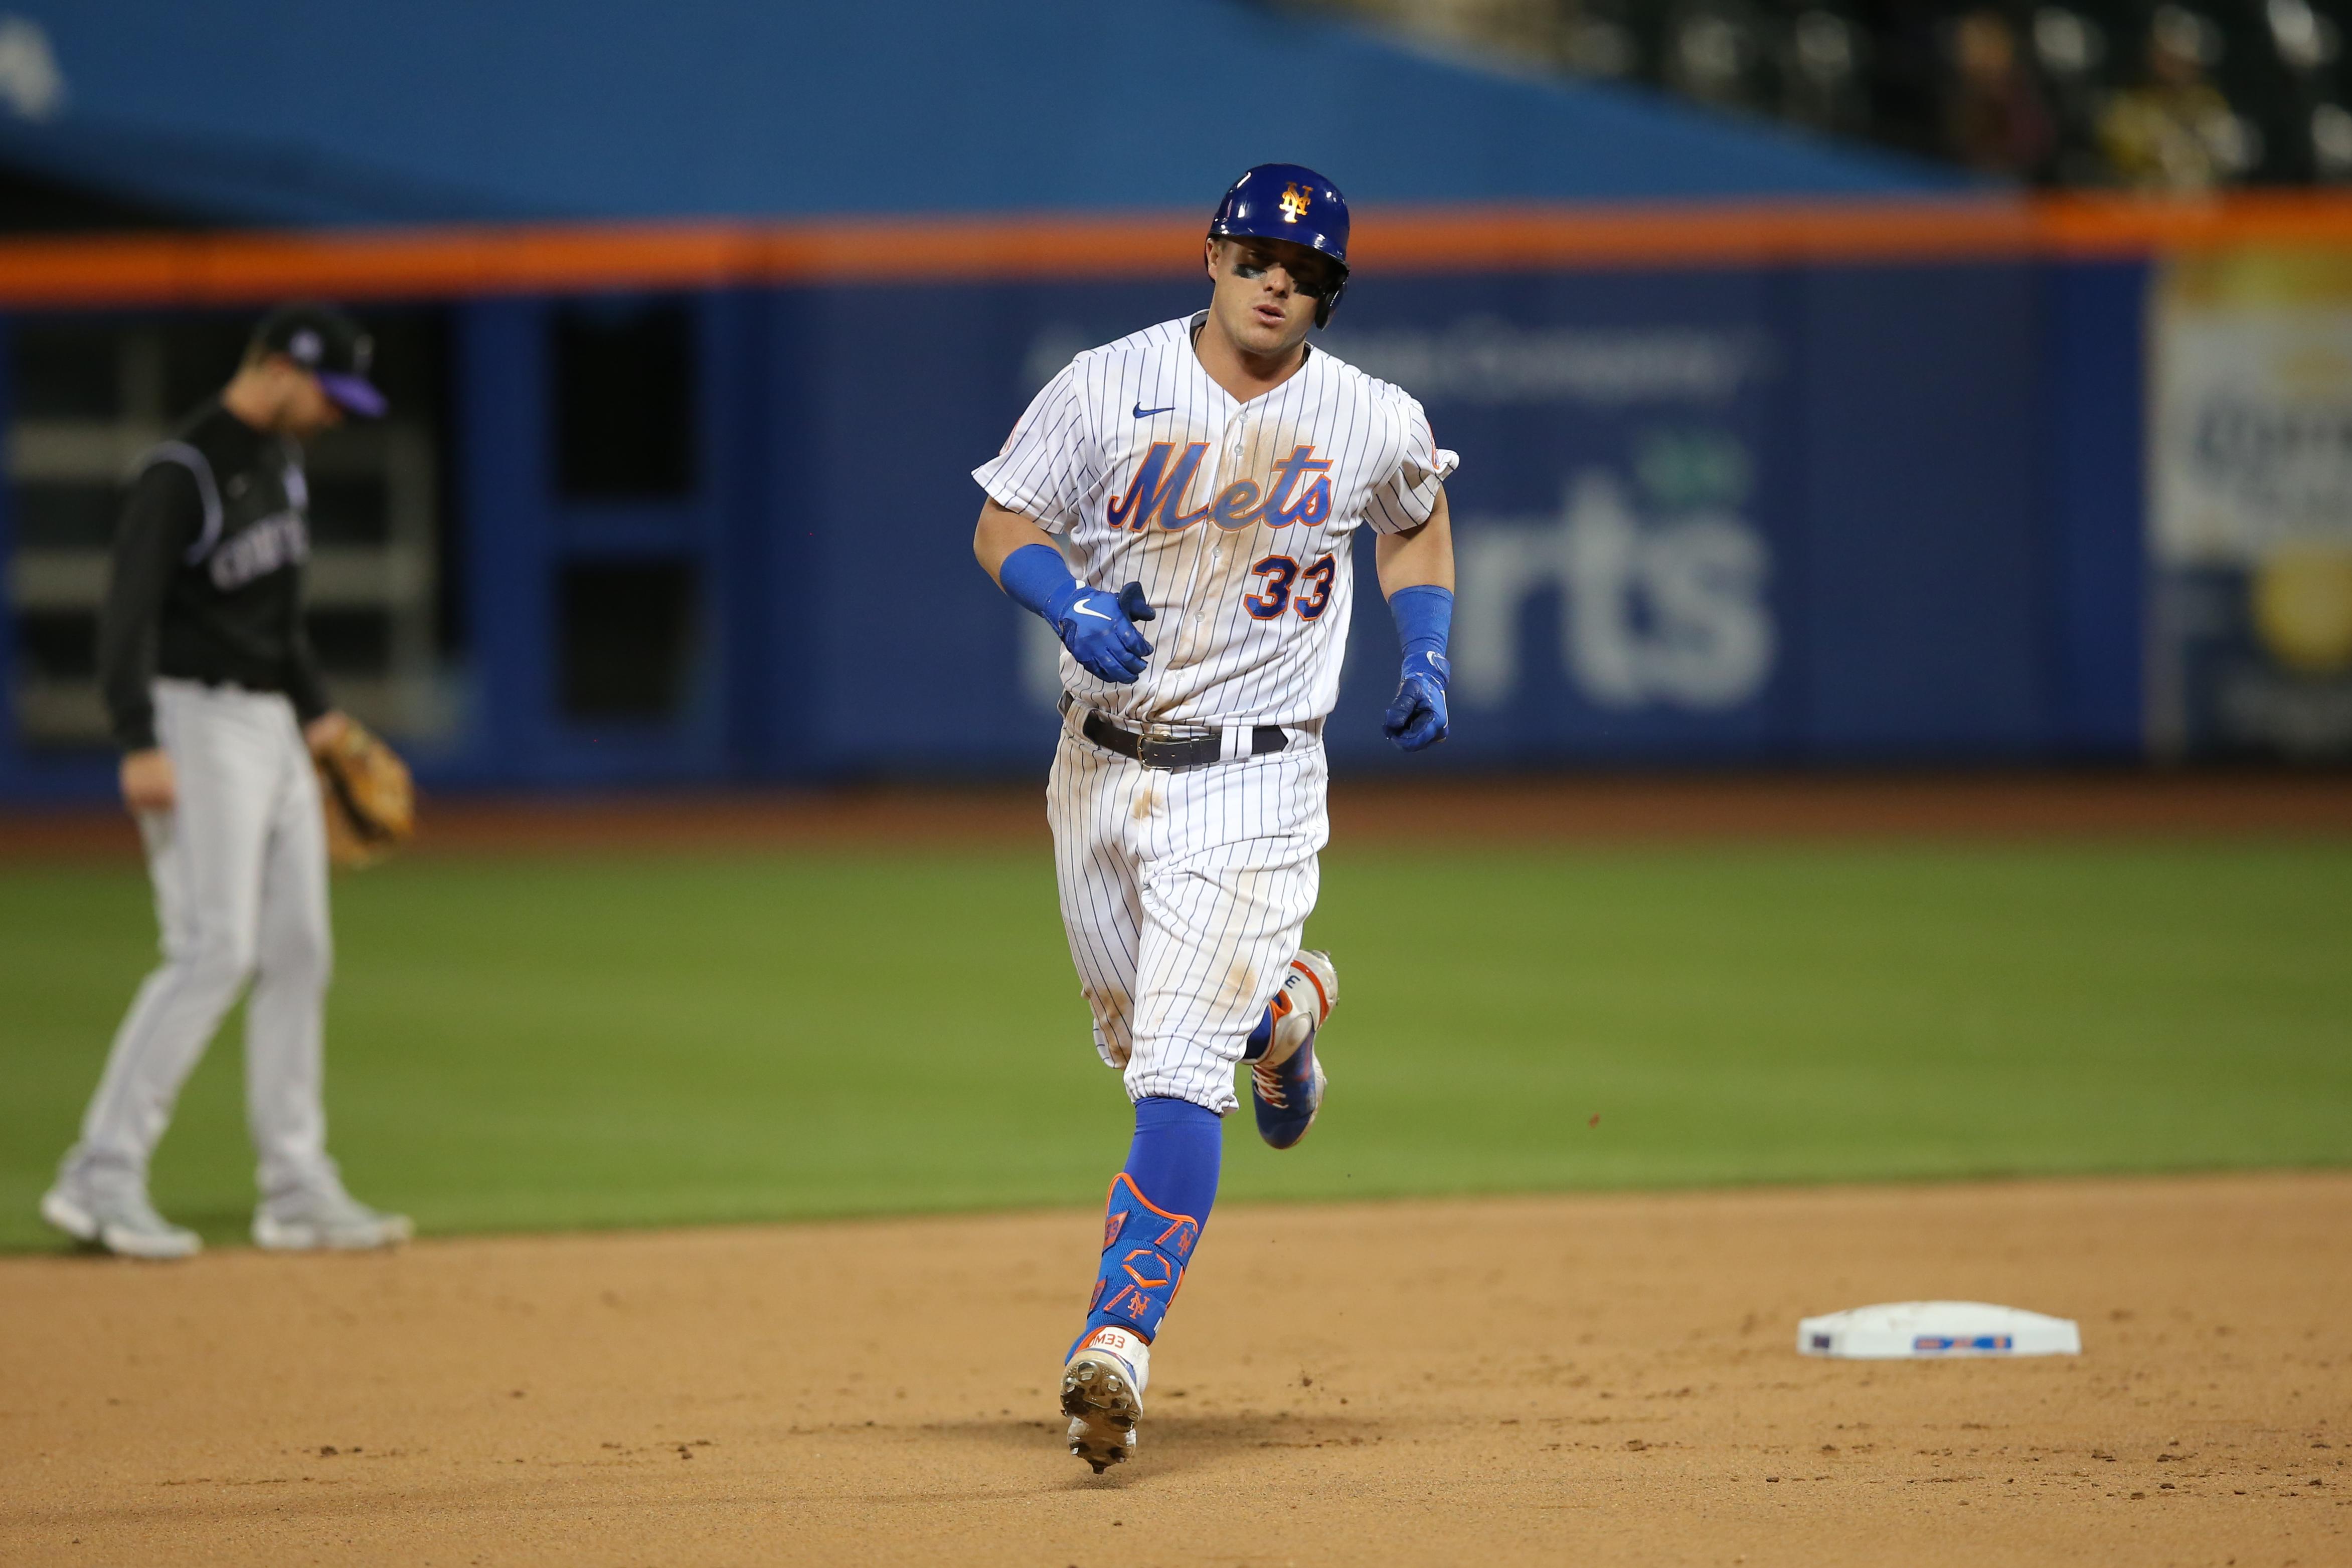 5/25/21 Game Preview: Colorado Rockies at New York Mets